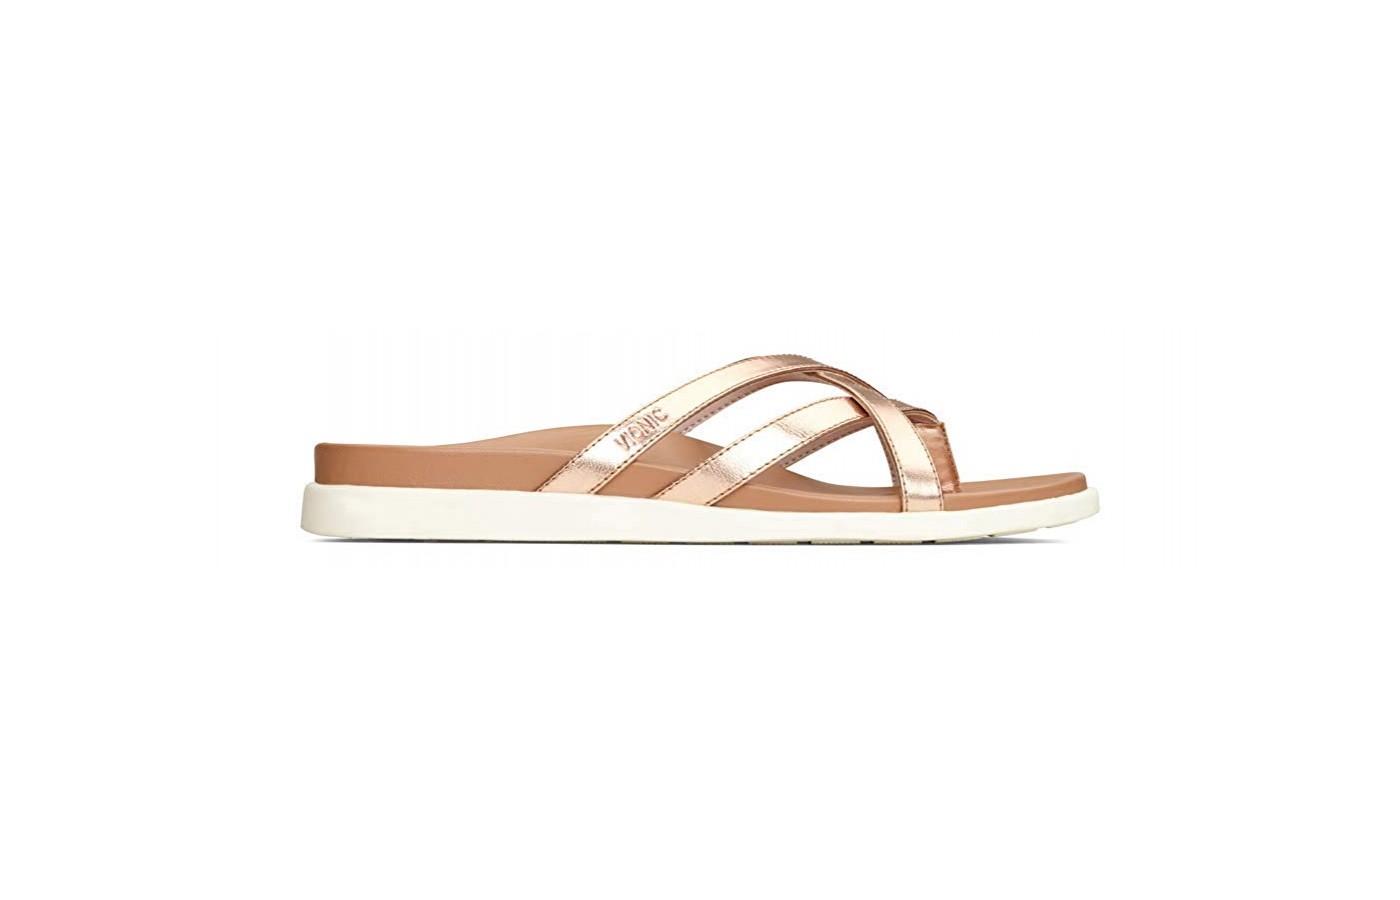 Vionic Palm Daisy sandal side view